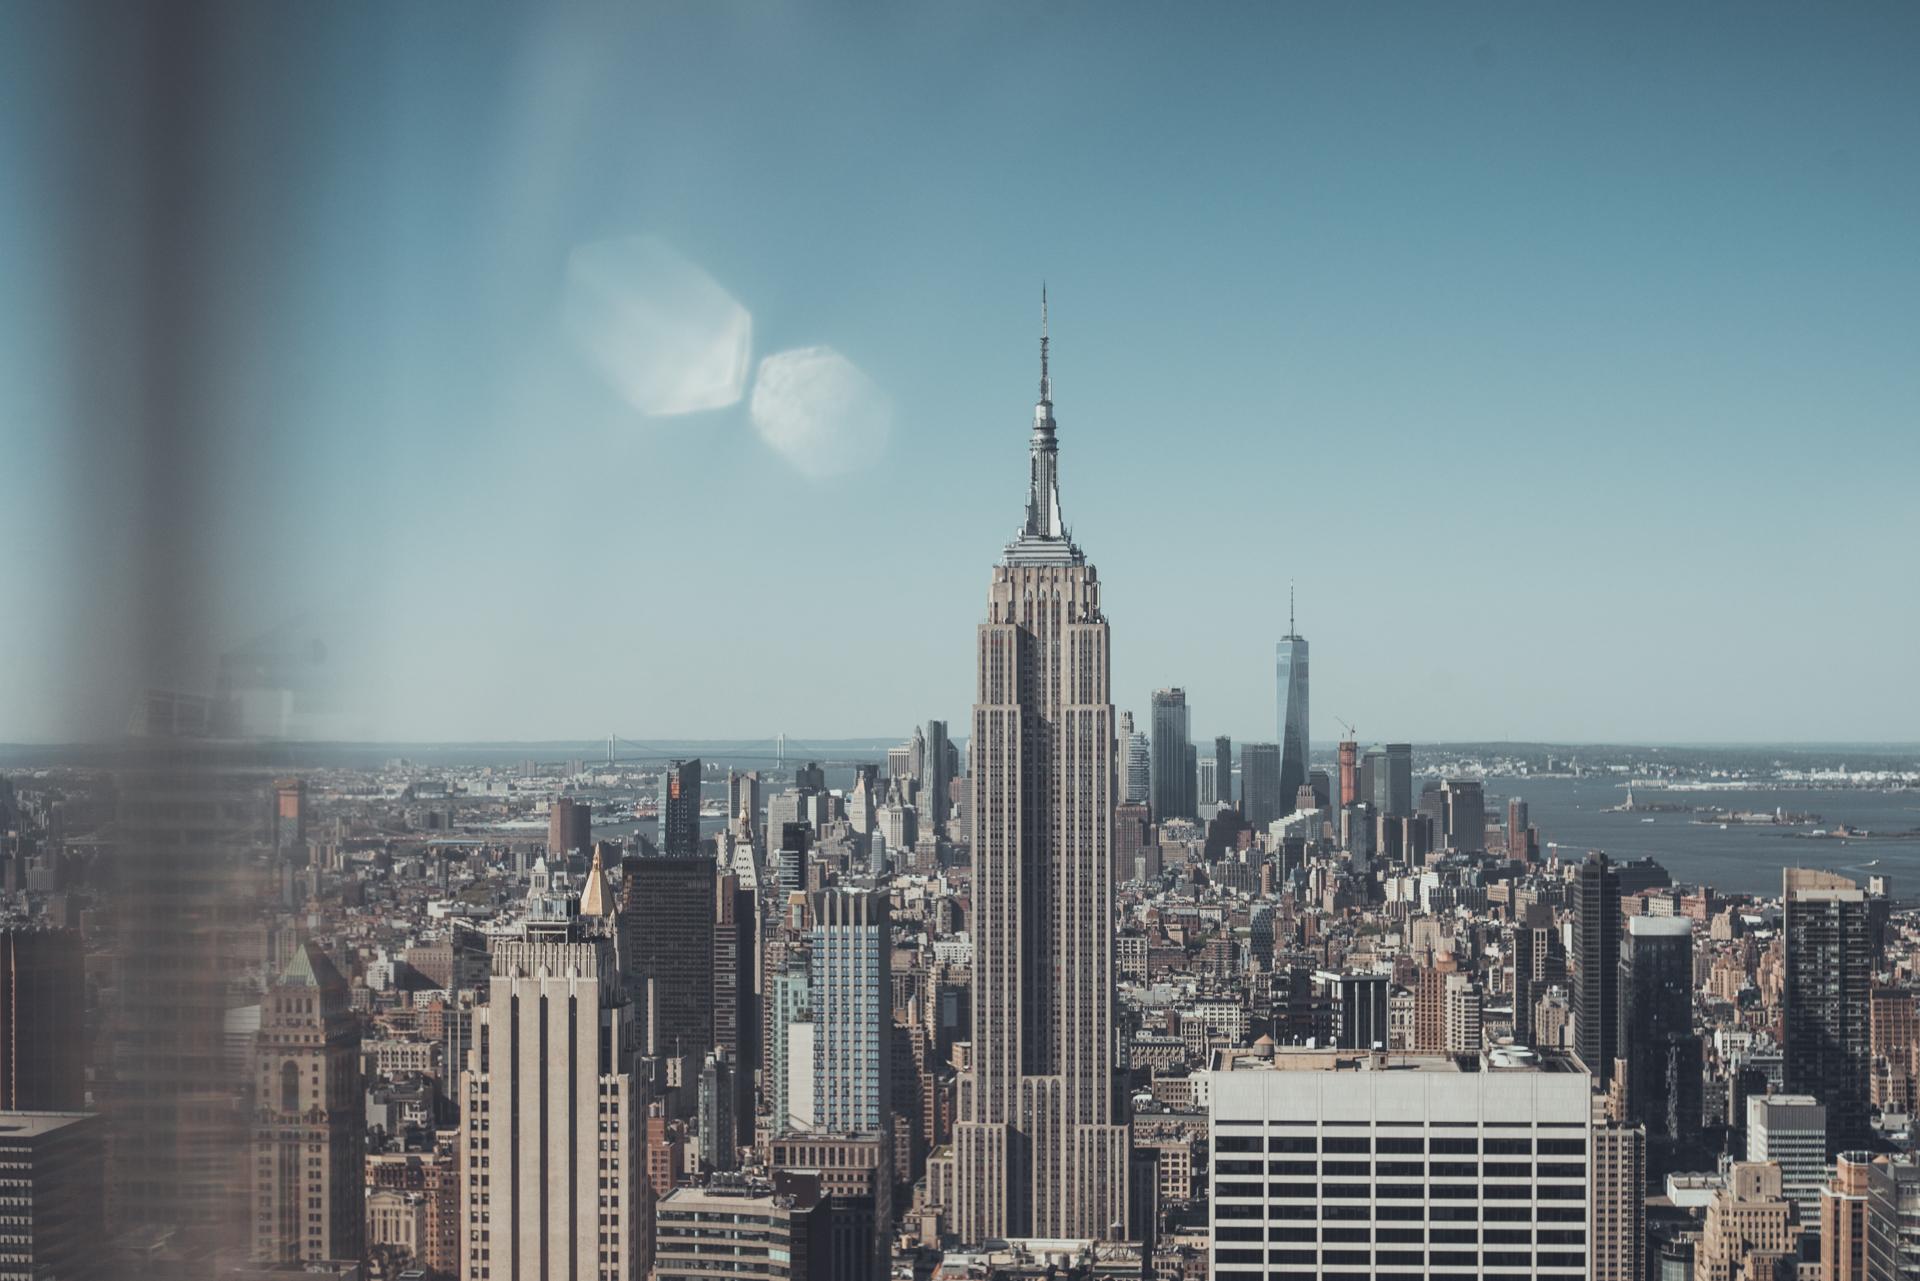 NYC_stijn_hoekstra-310.jpg